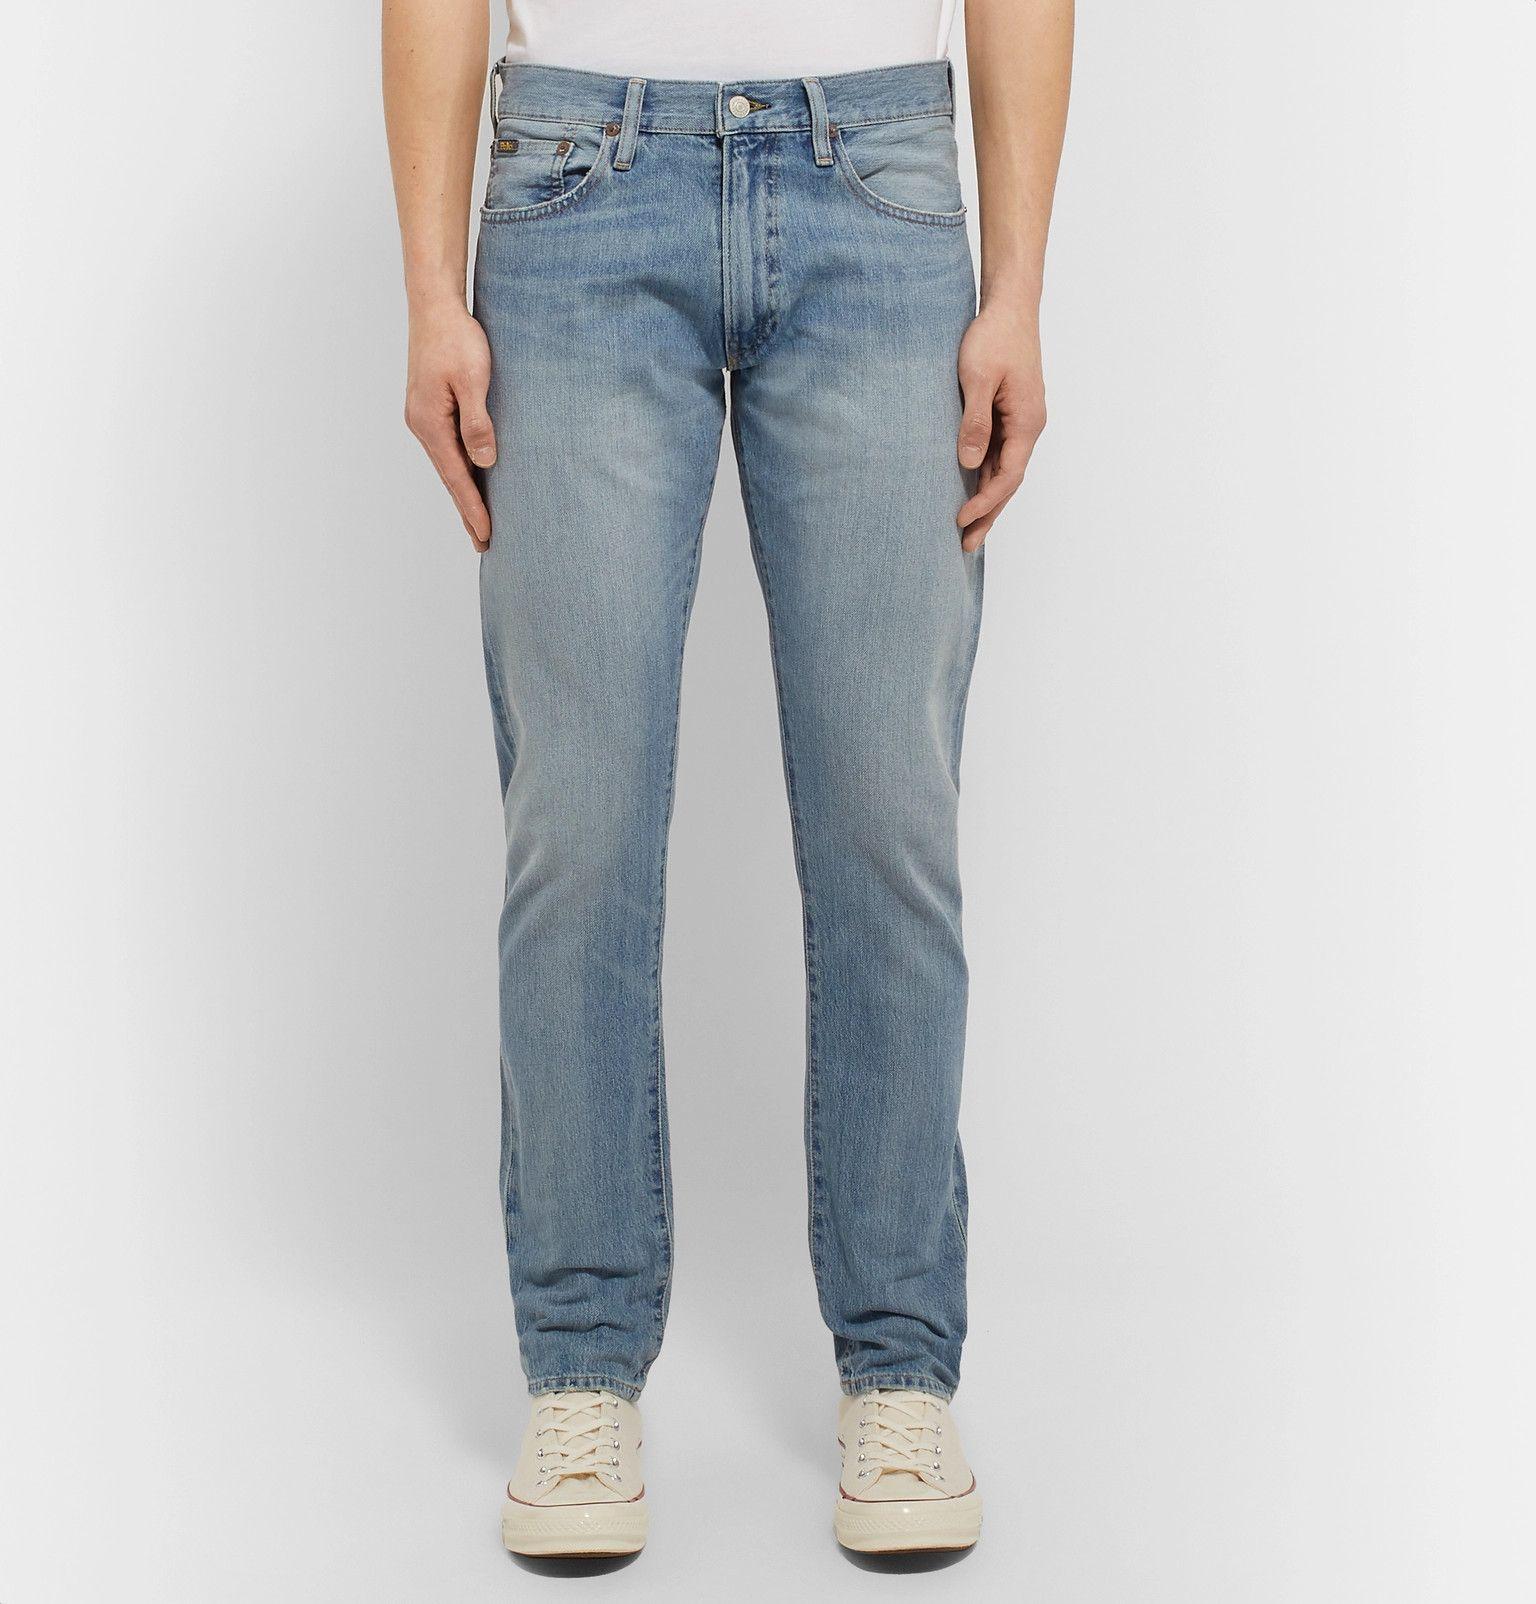 Blue slimfit stretchdenim jeans polo ralph lauren